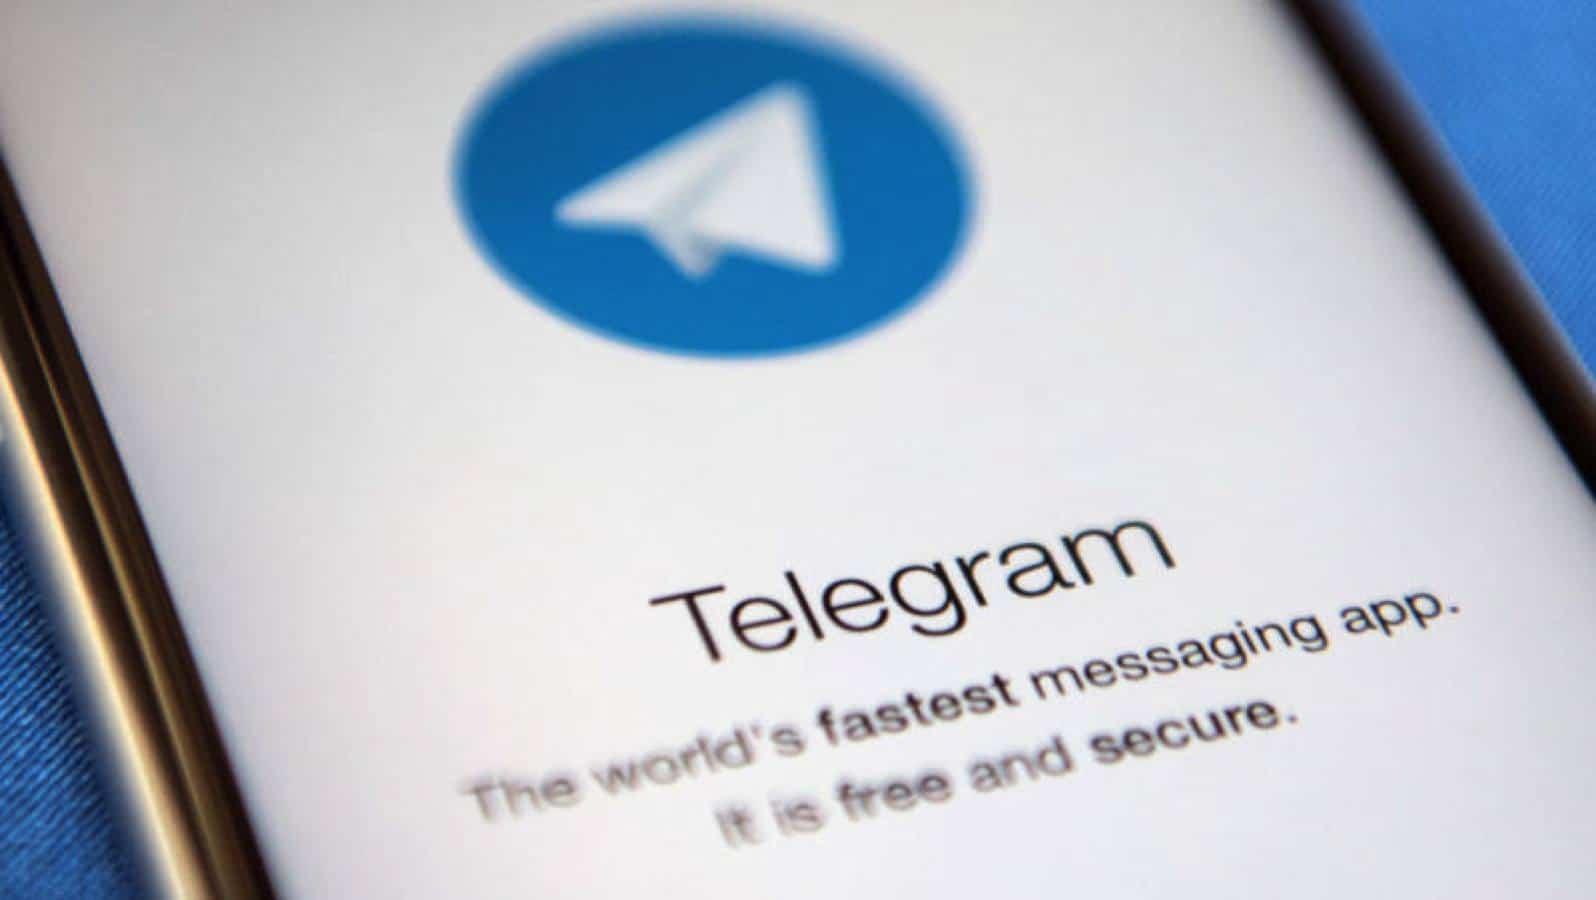 telegram app passport